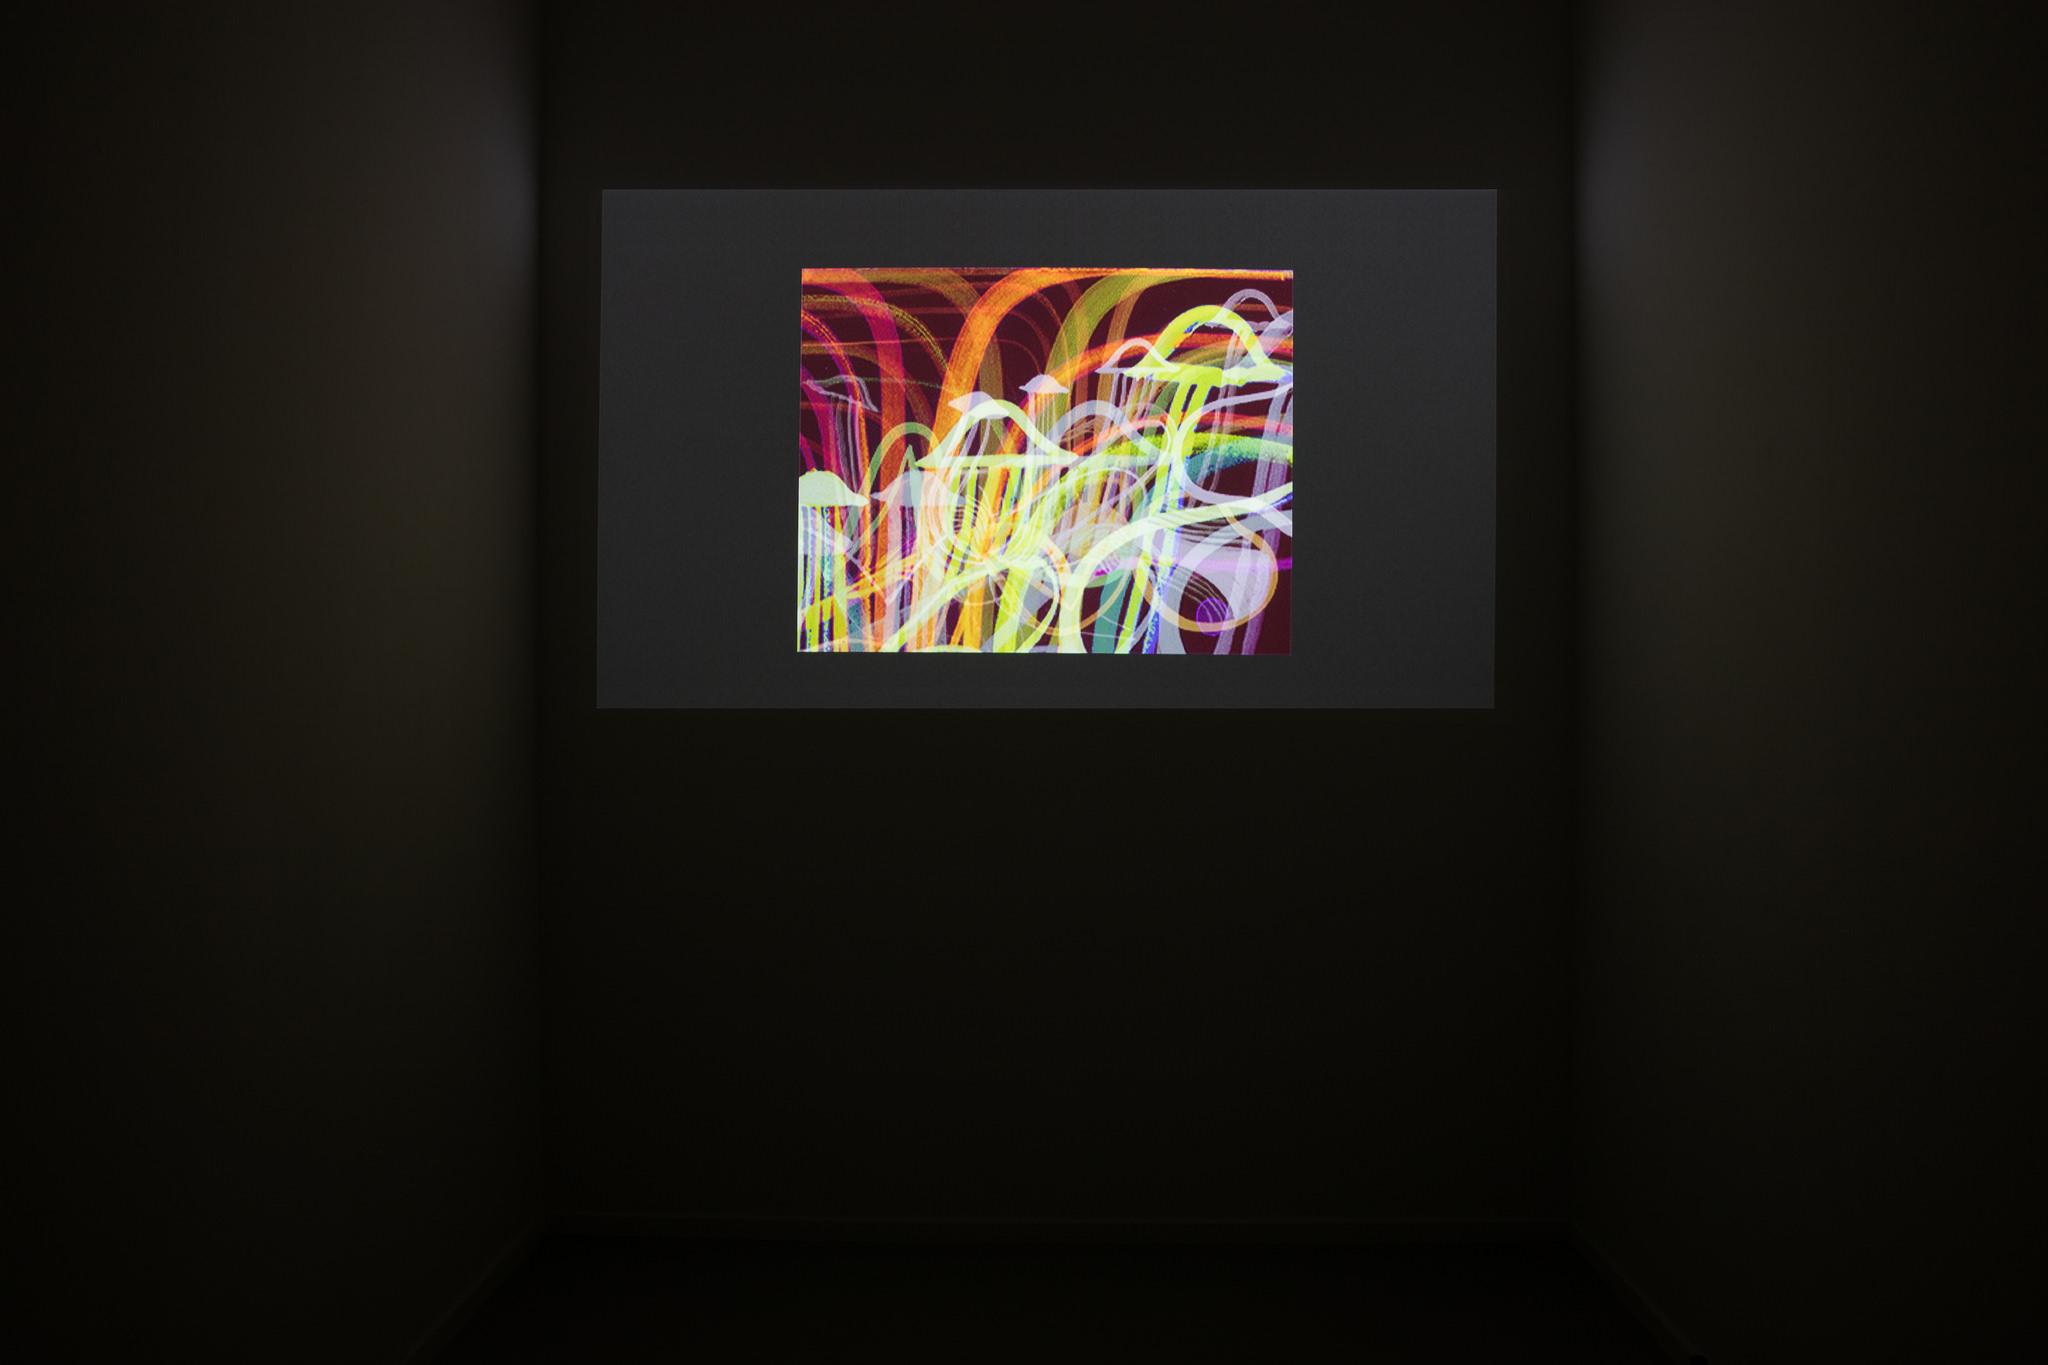 DRKRM, Gruppenausstellung, 2015, Ausstellungsansicht